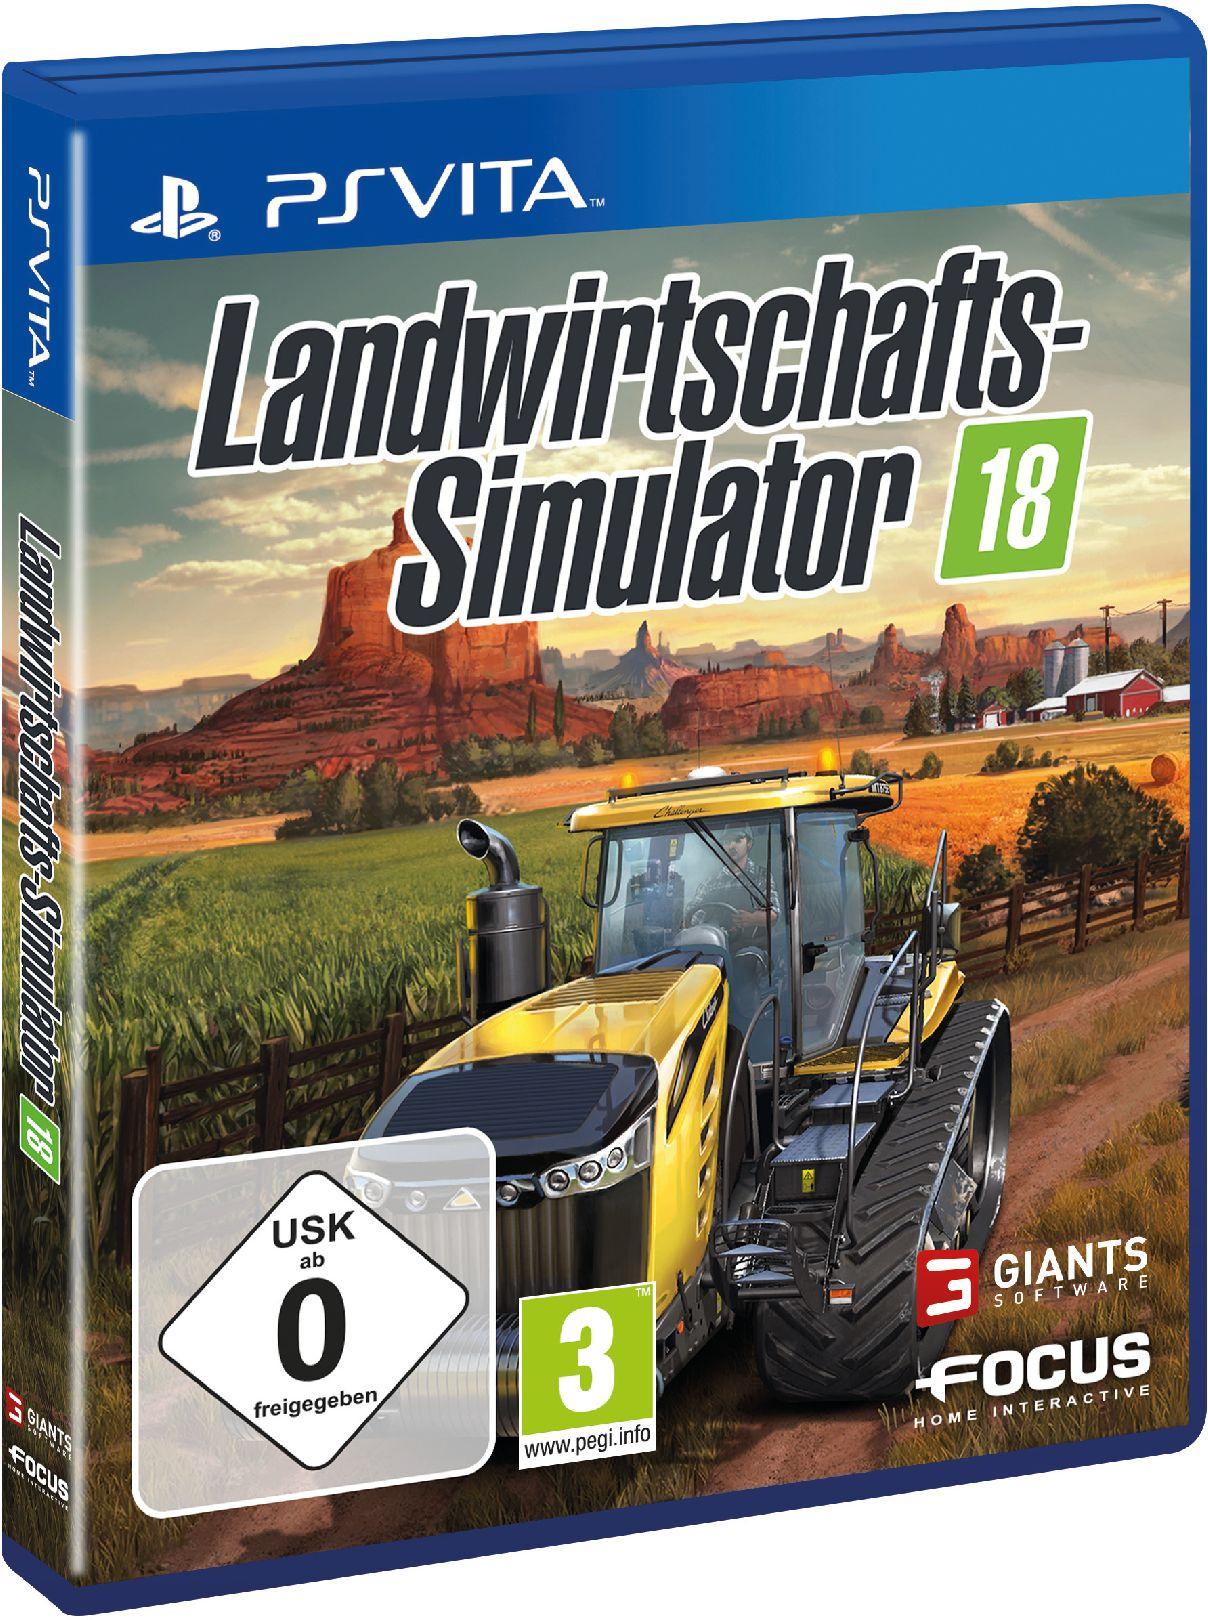 ASTRAGON Astragon Landwirtschafts-Simulator 18 »PS-Vita«